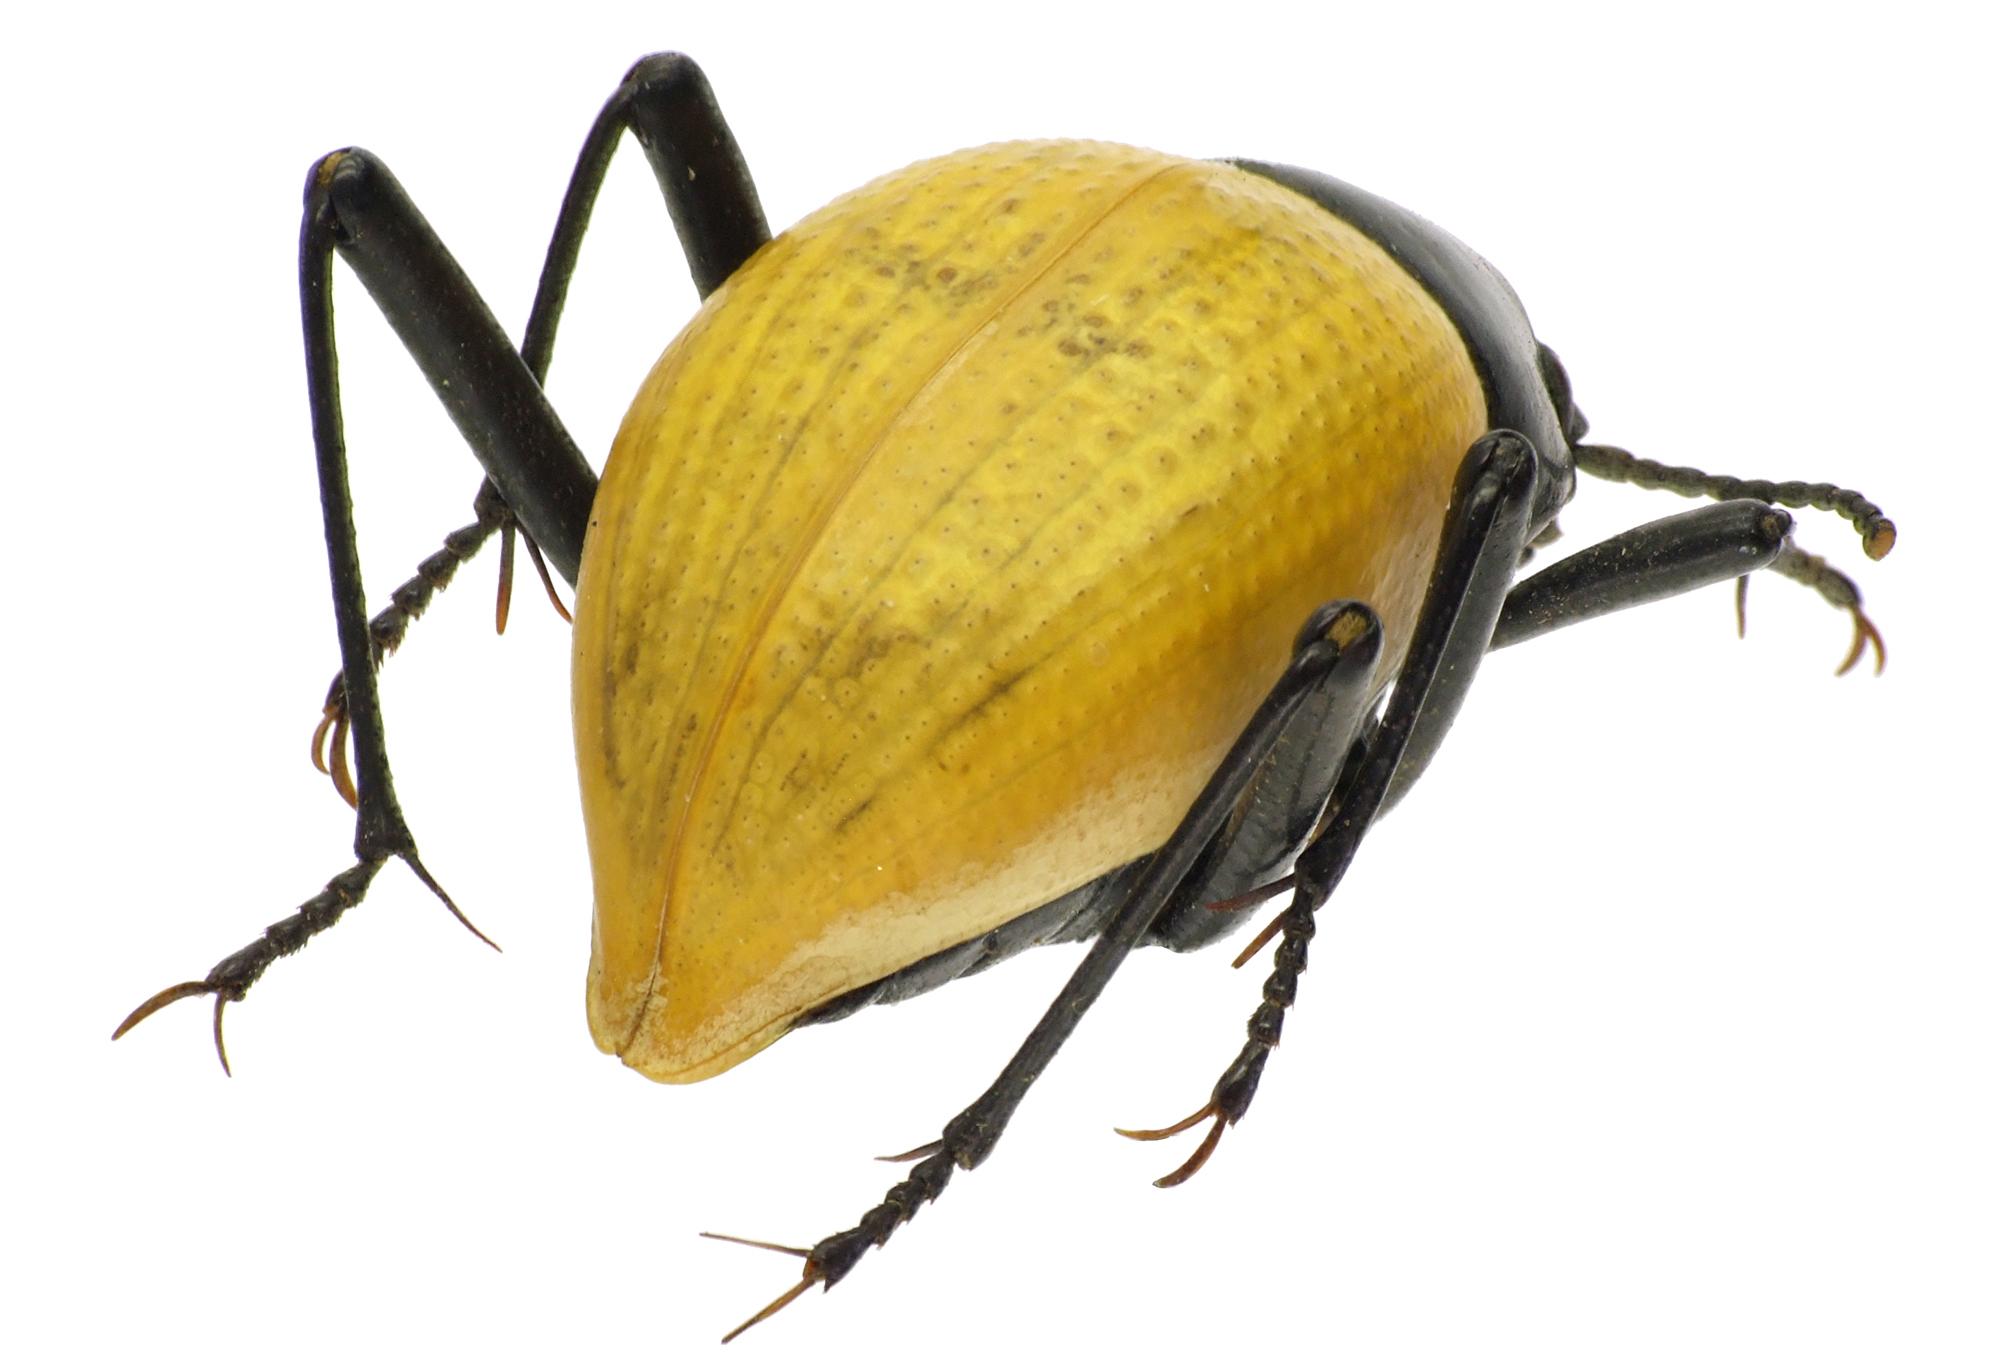 Onymacris bicolor bicolor 83250cz59.jpg